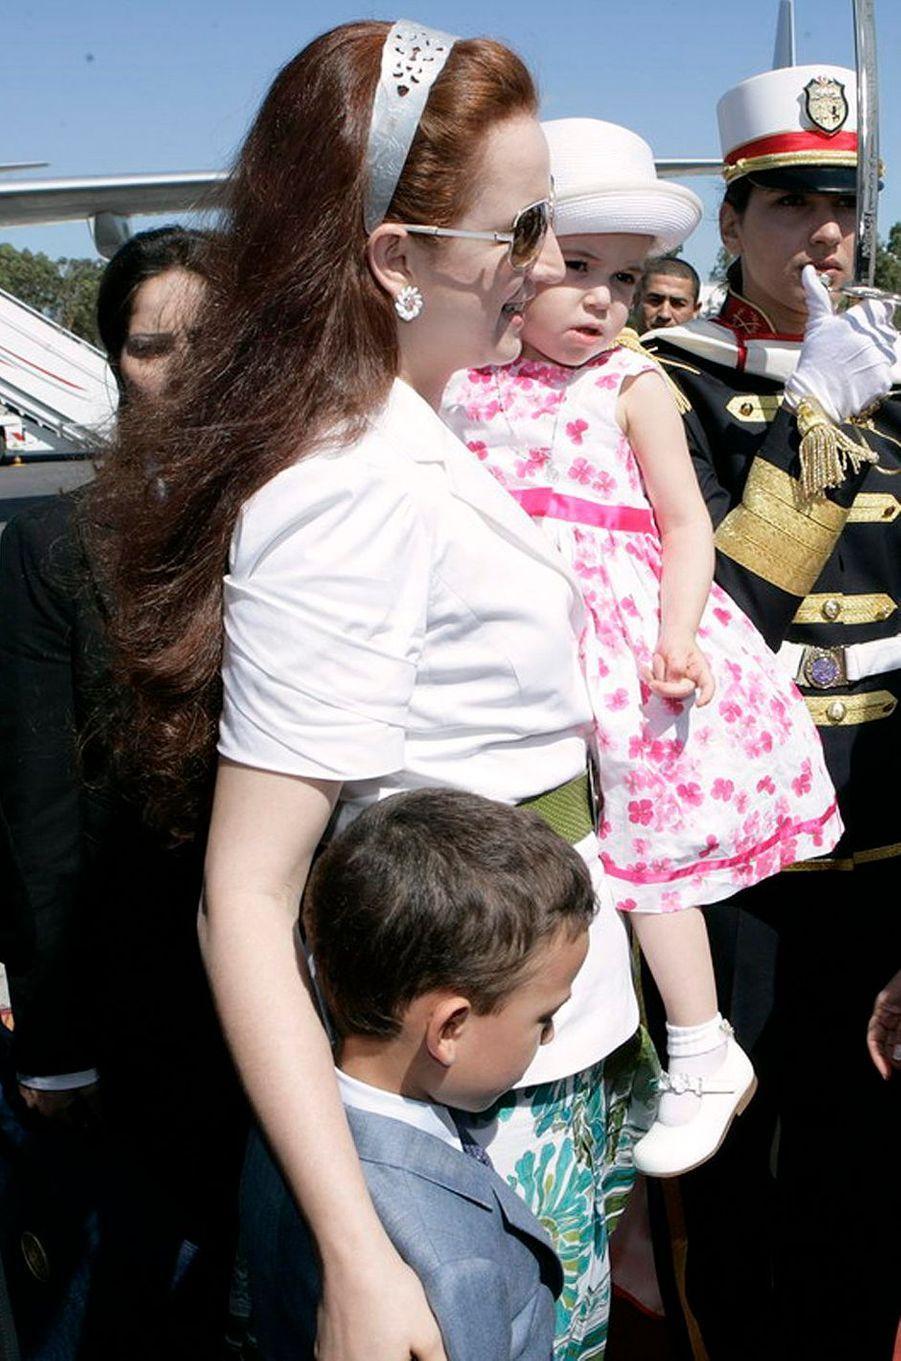 La princesse Lalla Khadija du Maroc avec sa mère la princesse Lalla Salma et son frère, le 25 septembre 2009